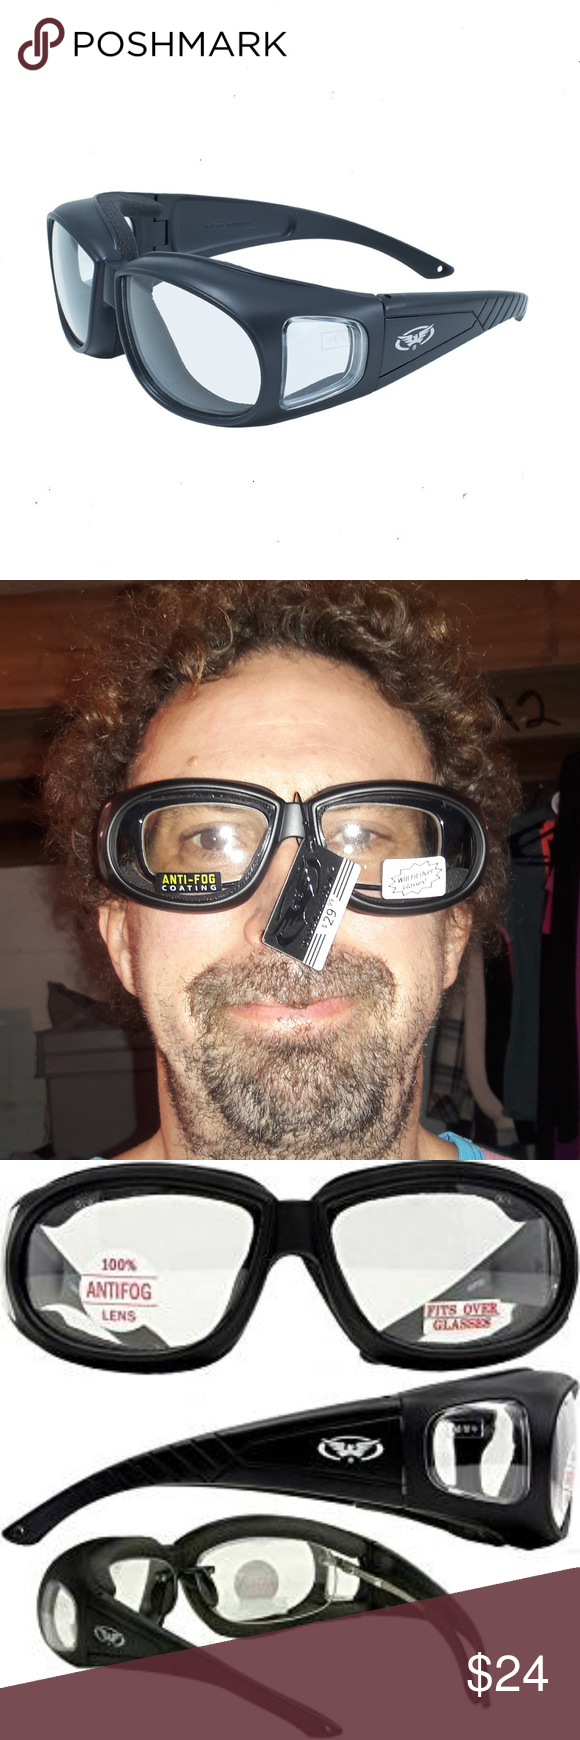 Z87 Fit Over Glasses Sunglasses Clear Lens Horse Boutique